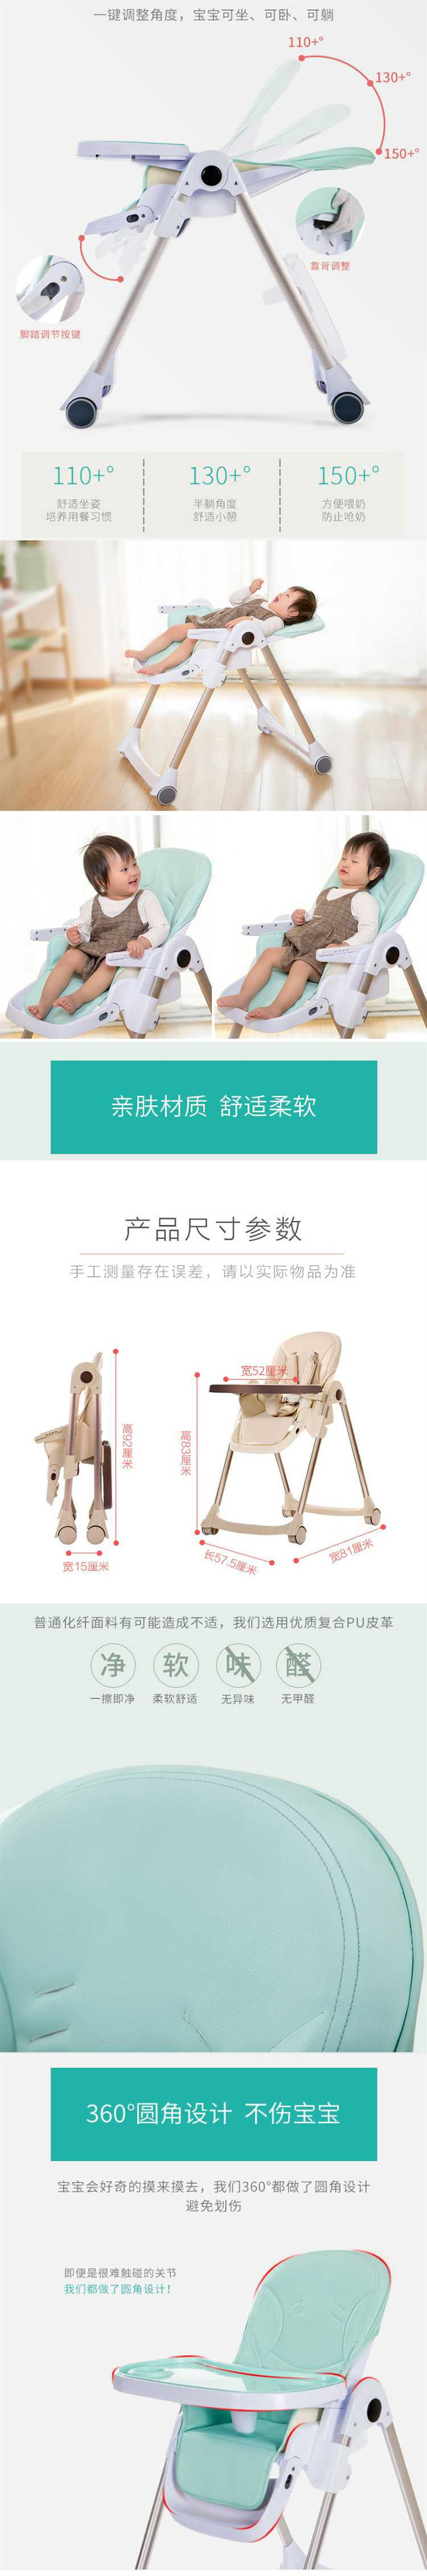 https://xiaoba.shall-buy.com/attachment/images/13938/2019/07/a2cC8VBqL8hZjV782kq8YS688HsHMc.jpg